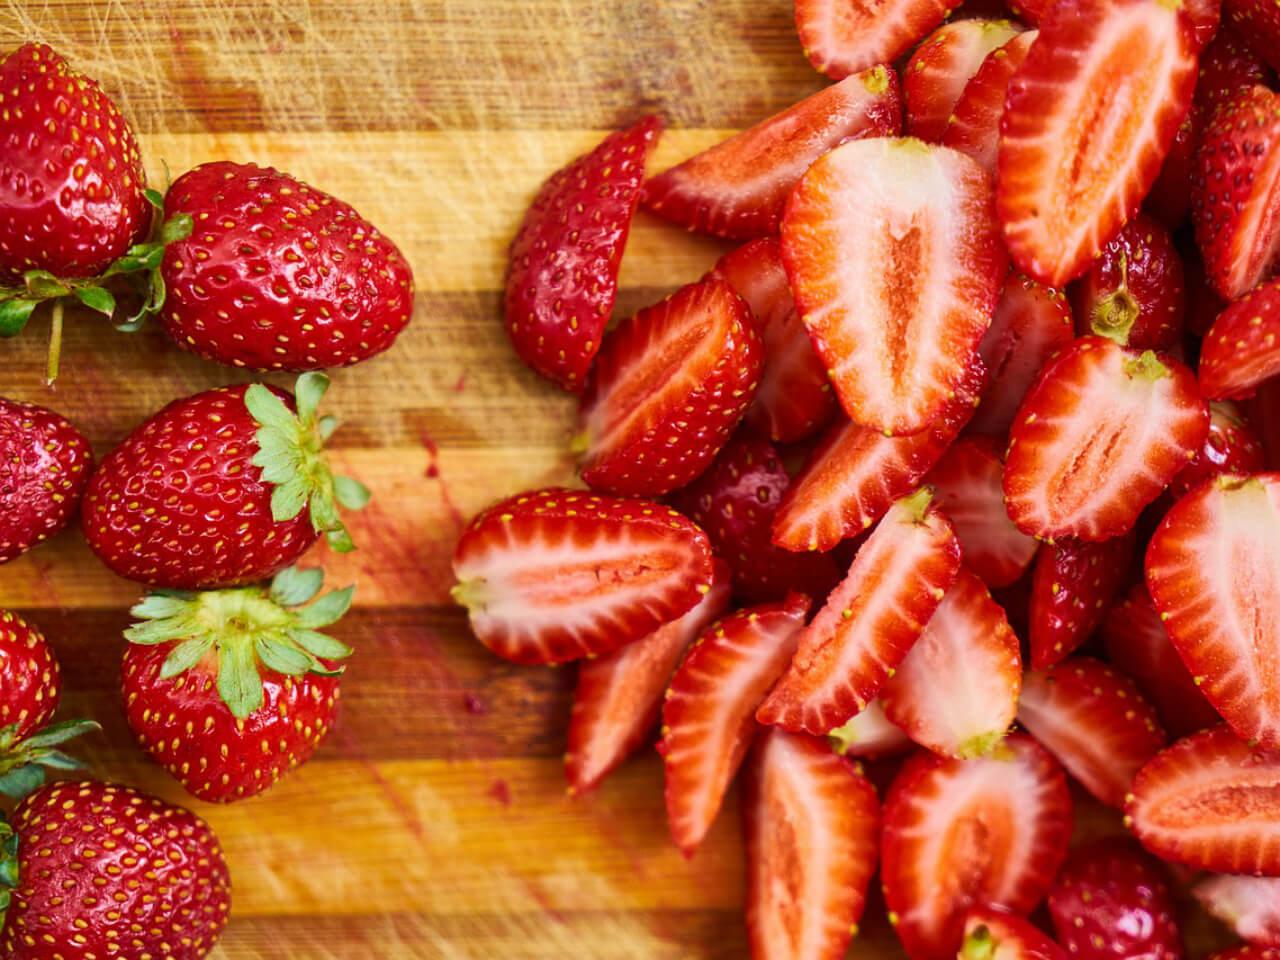 Strawberry Salad Poppyseed Dressing